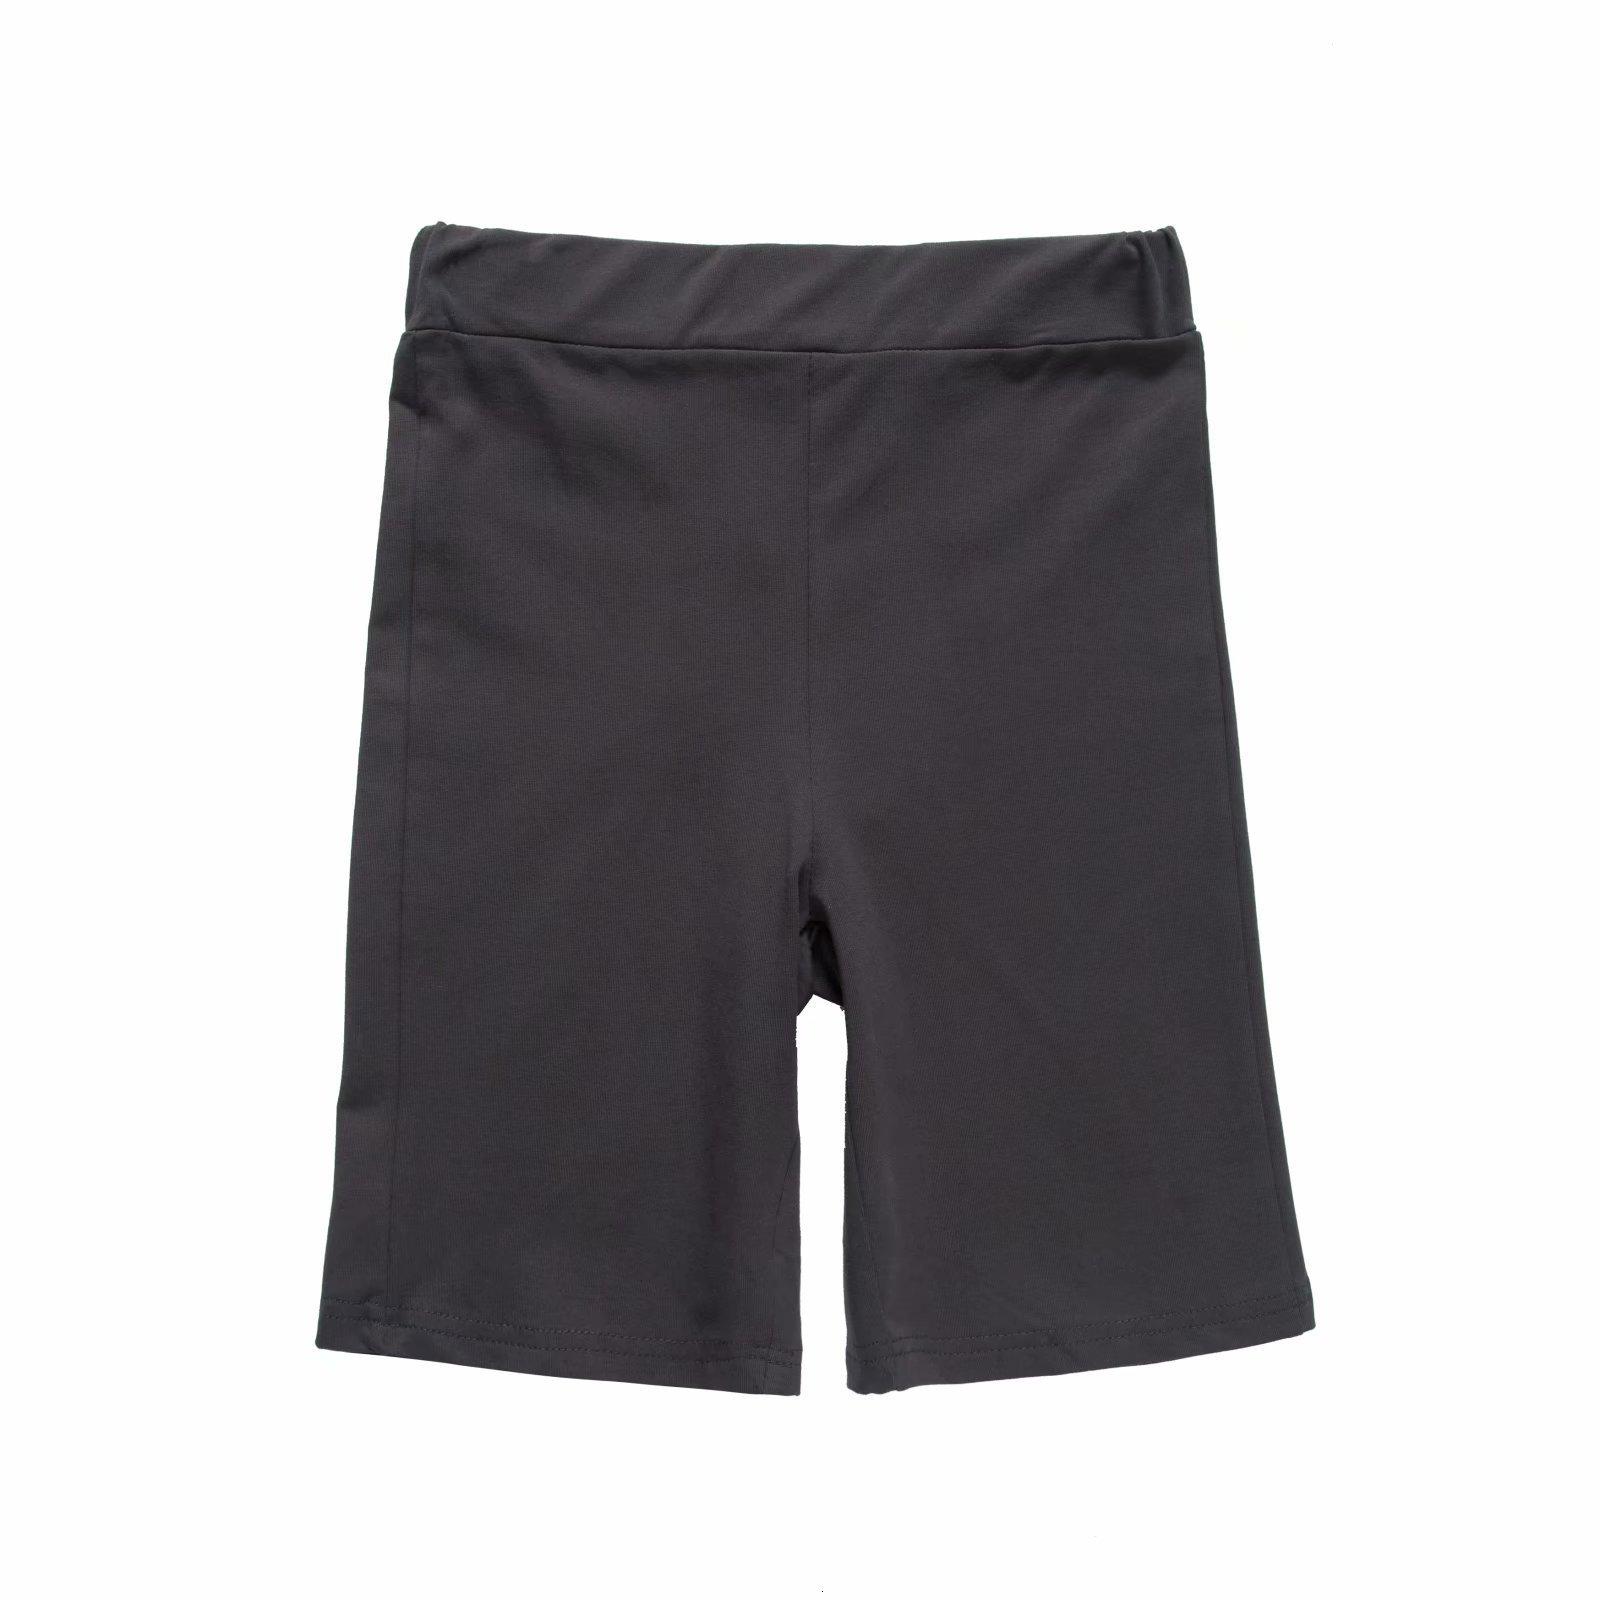 High Street Womens leggings Skin Tight Short Sport Pants Fashion Solid Bike Shorts for Female INS Hot Sale Sports Leggings1